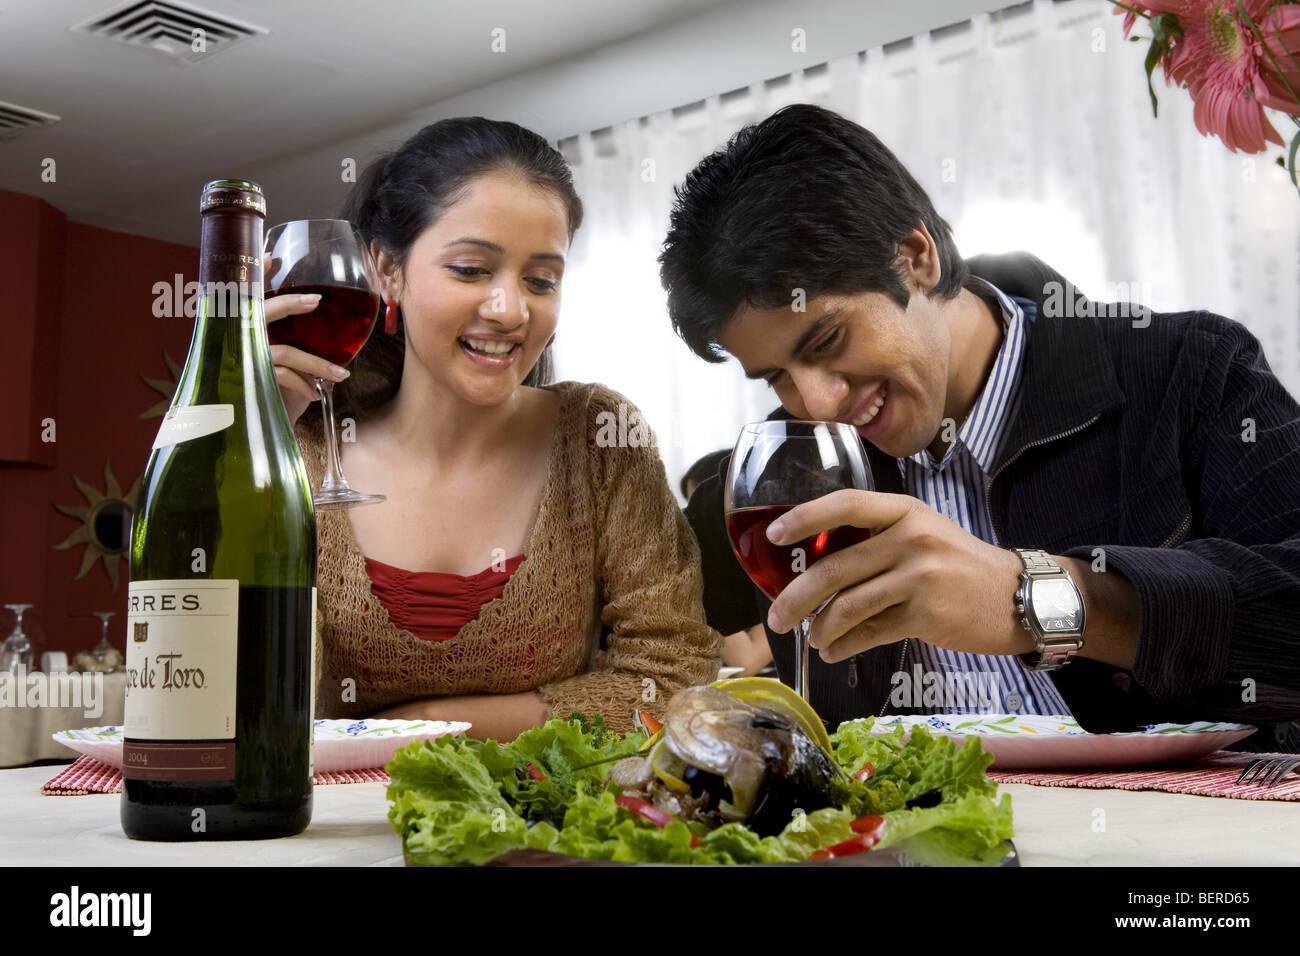 Par disfrutar de una comida Imagen De Stock